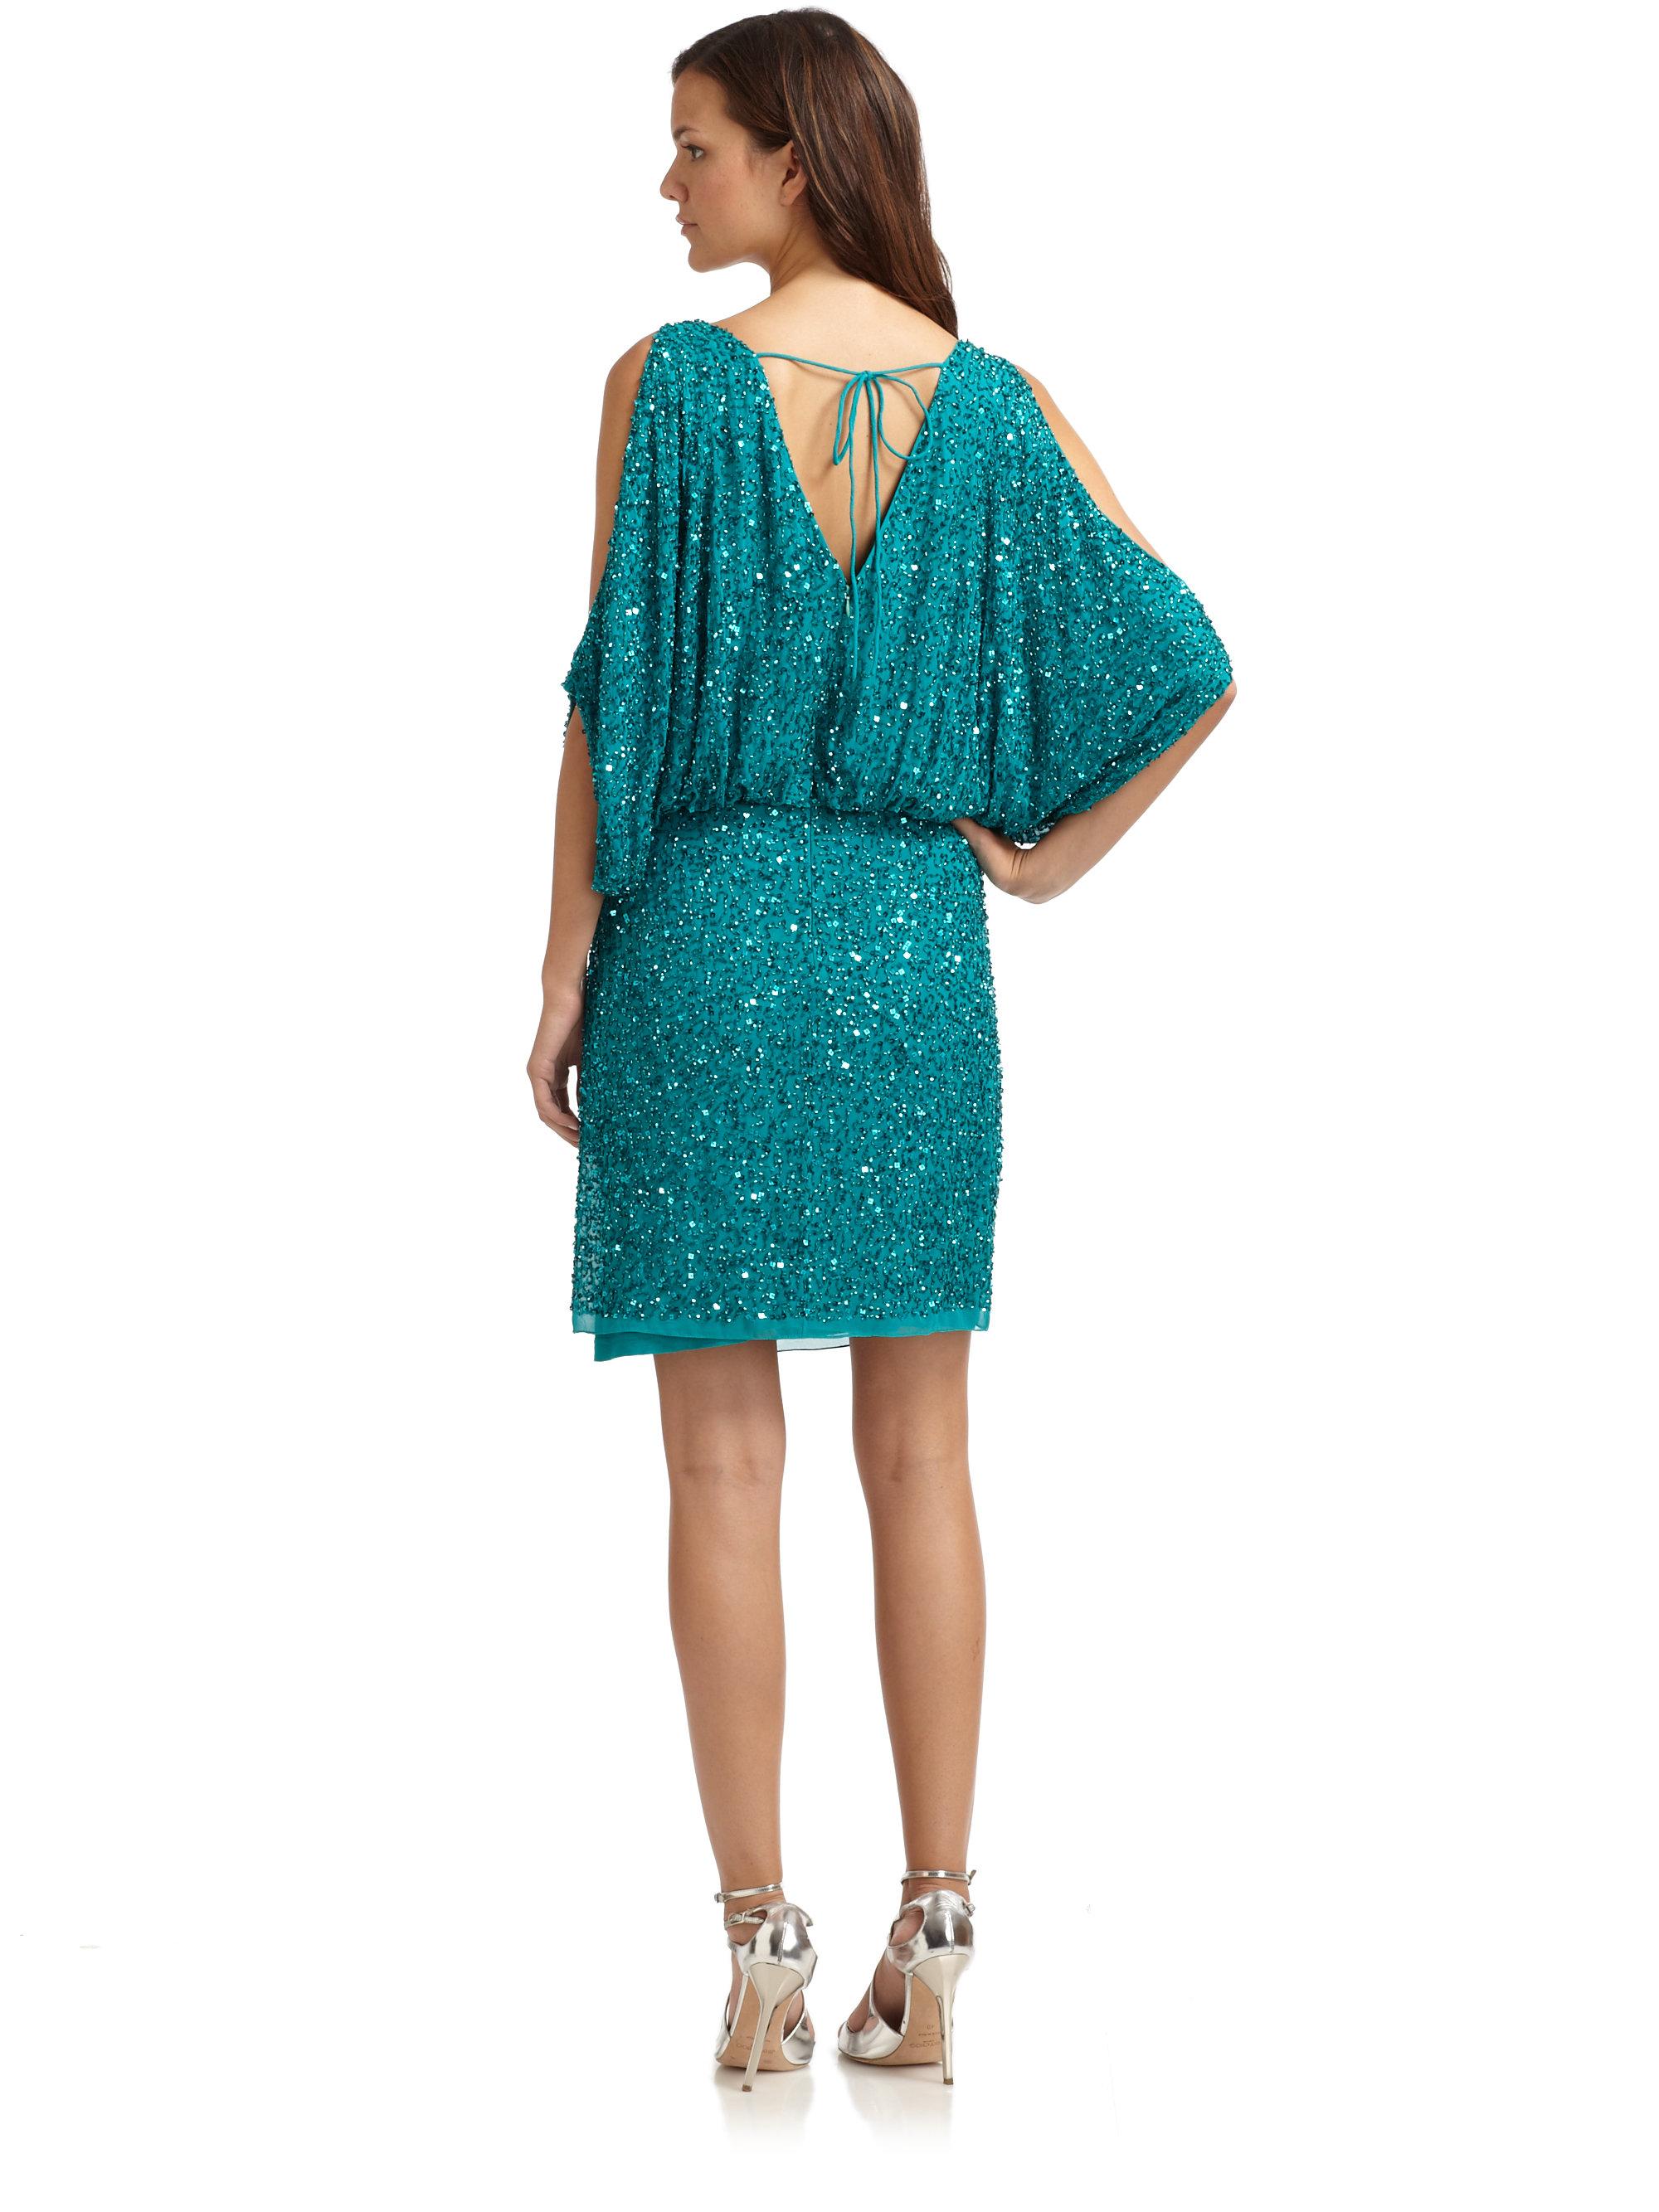 Aidan mattox Sequin Shoulder Cutout Cocktail Dress in Blue | Lyst